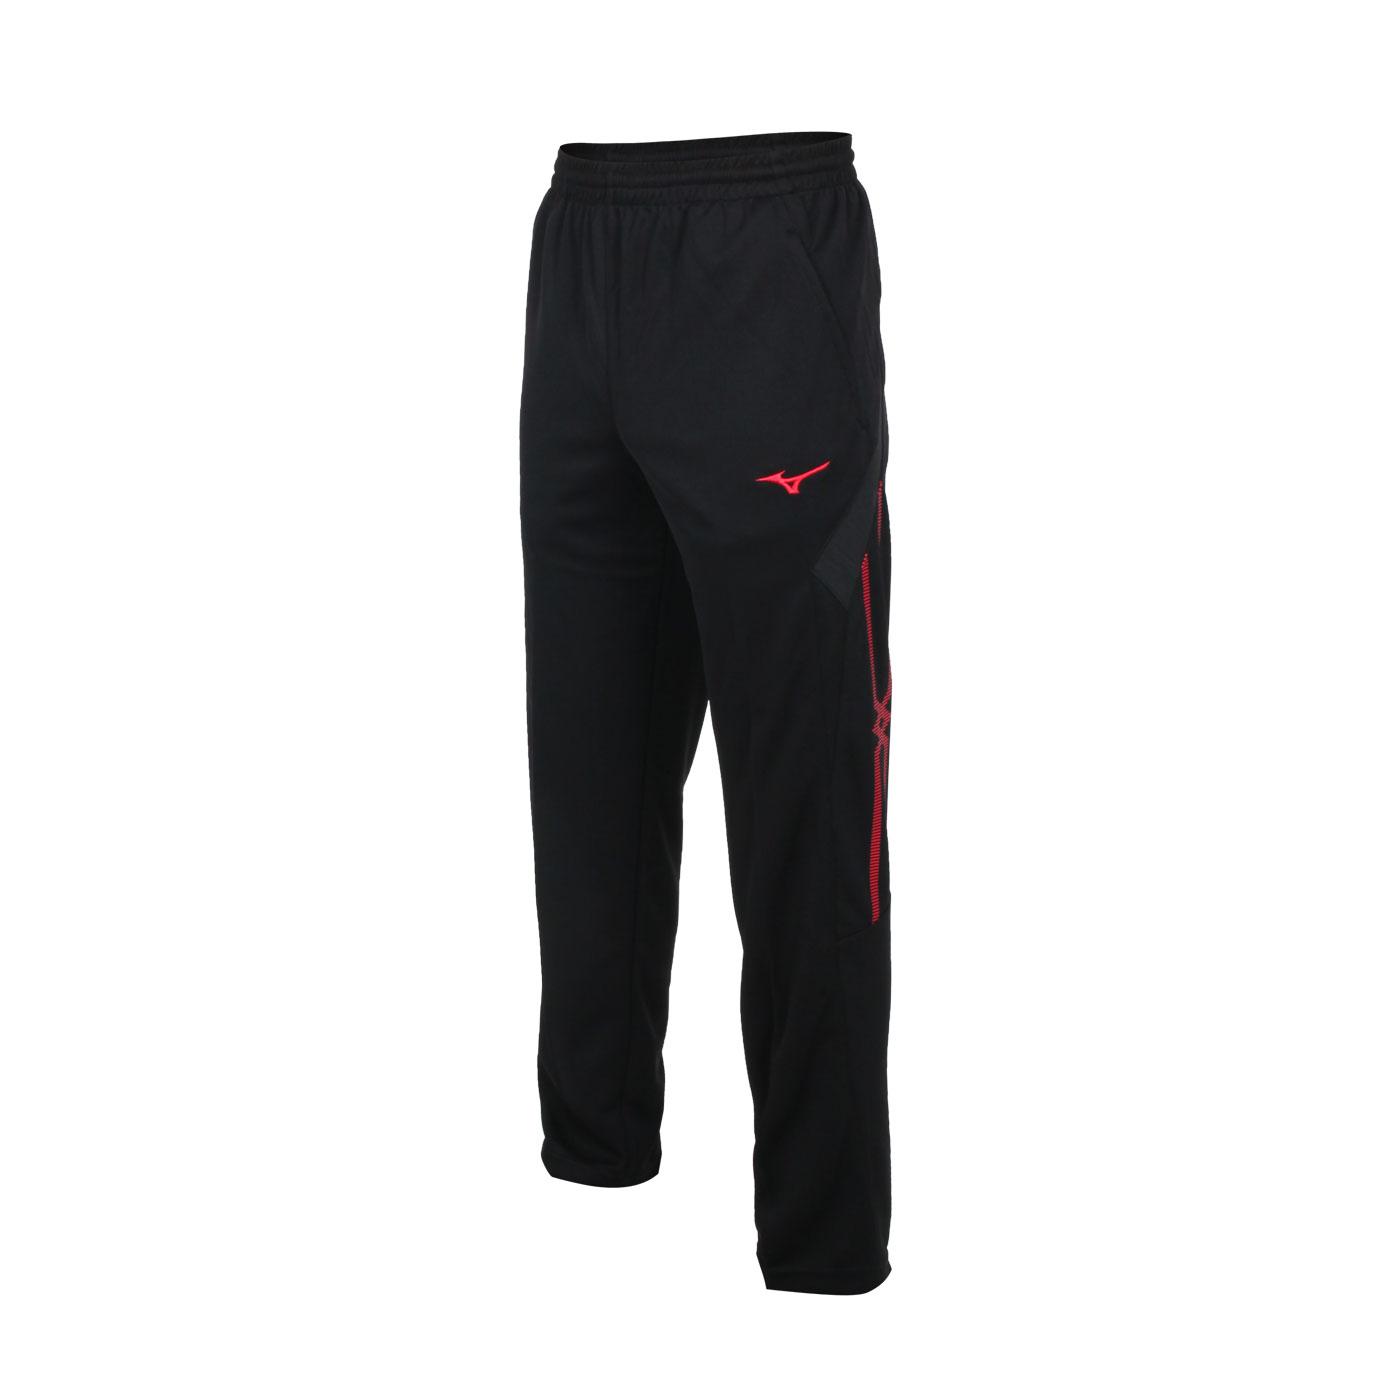 MIZUNO 男款針織長褲 32TD153499 - 黑紅